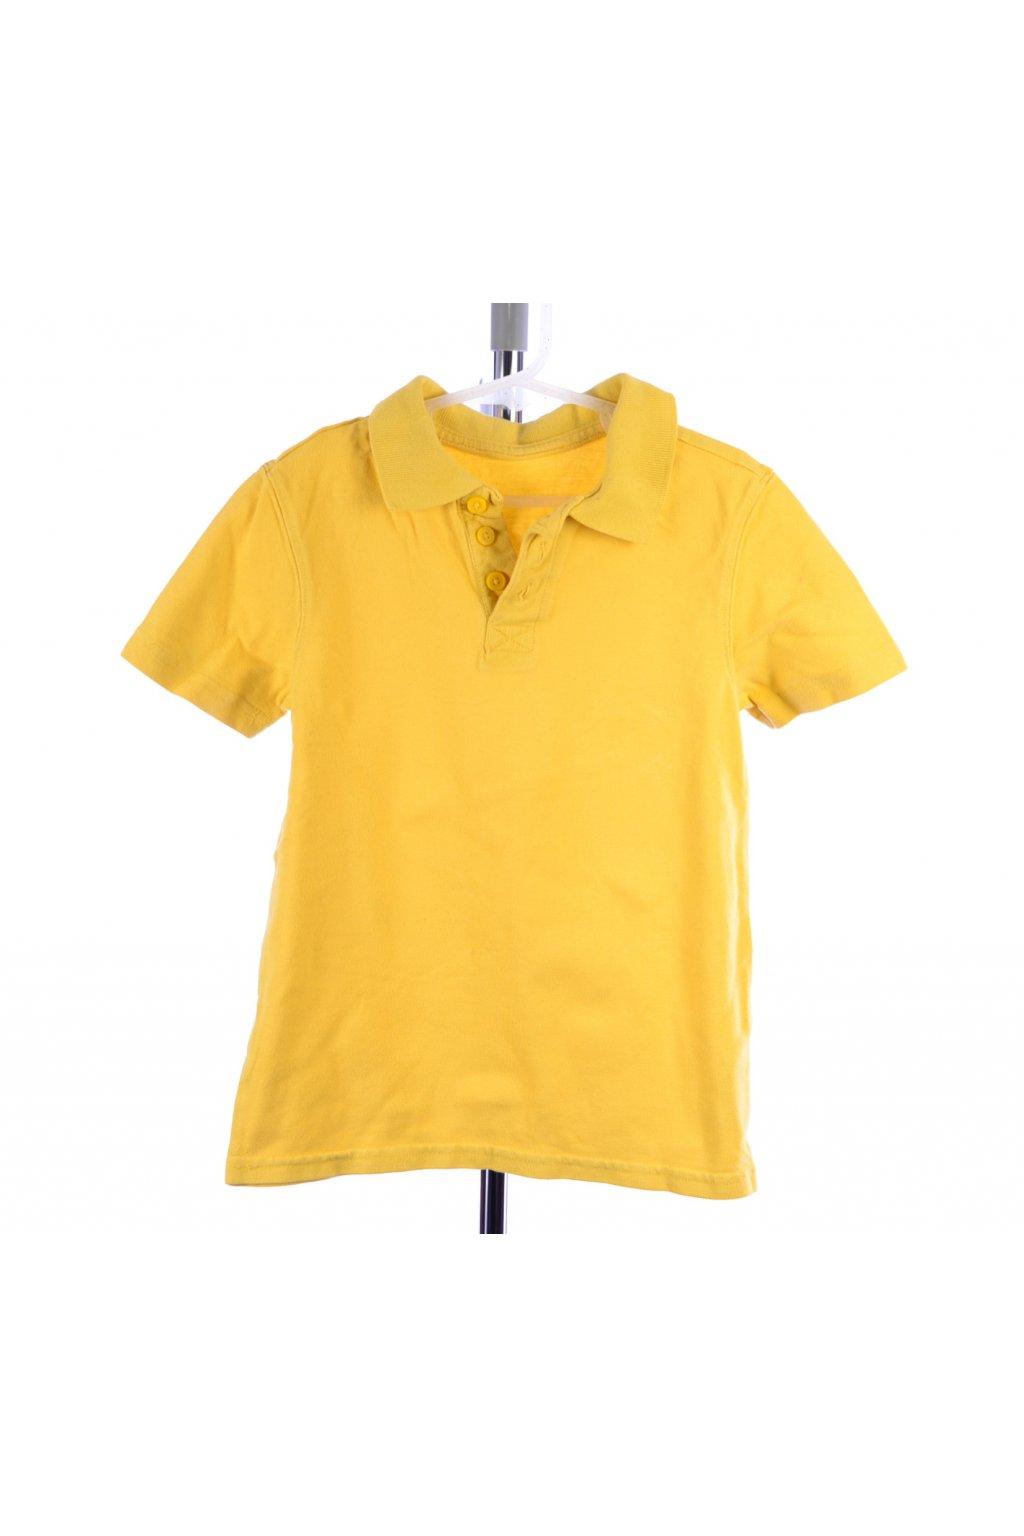 Tričko žluté F&F vel. 116